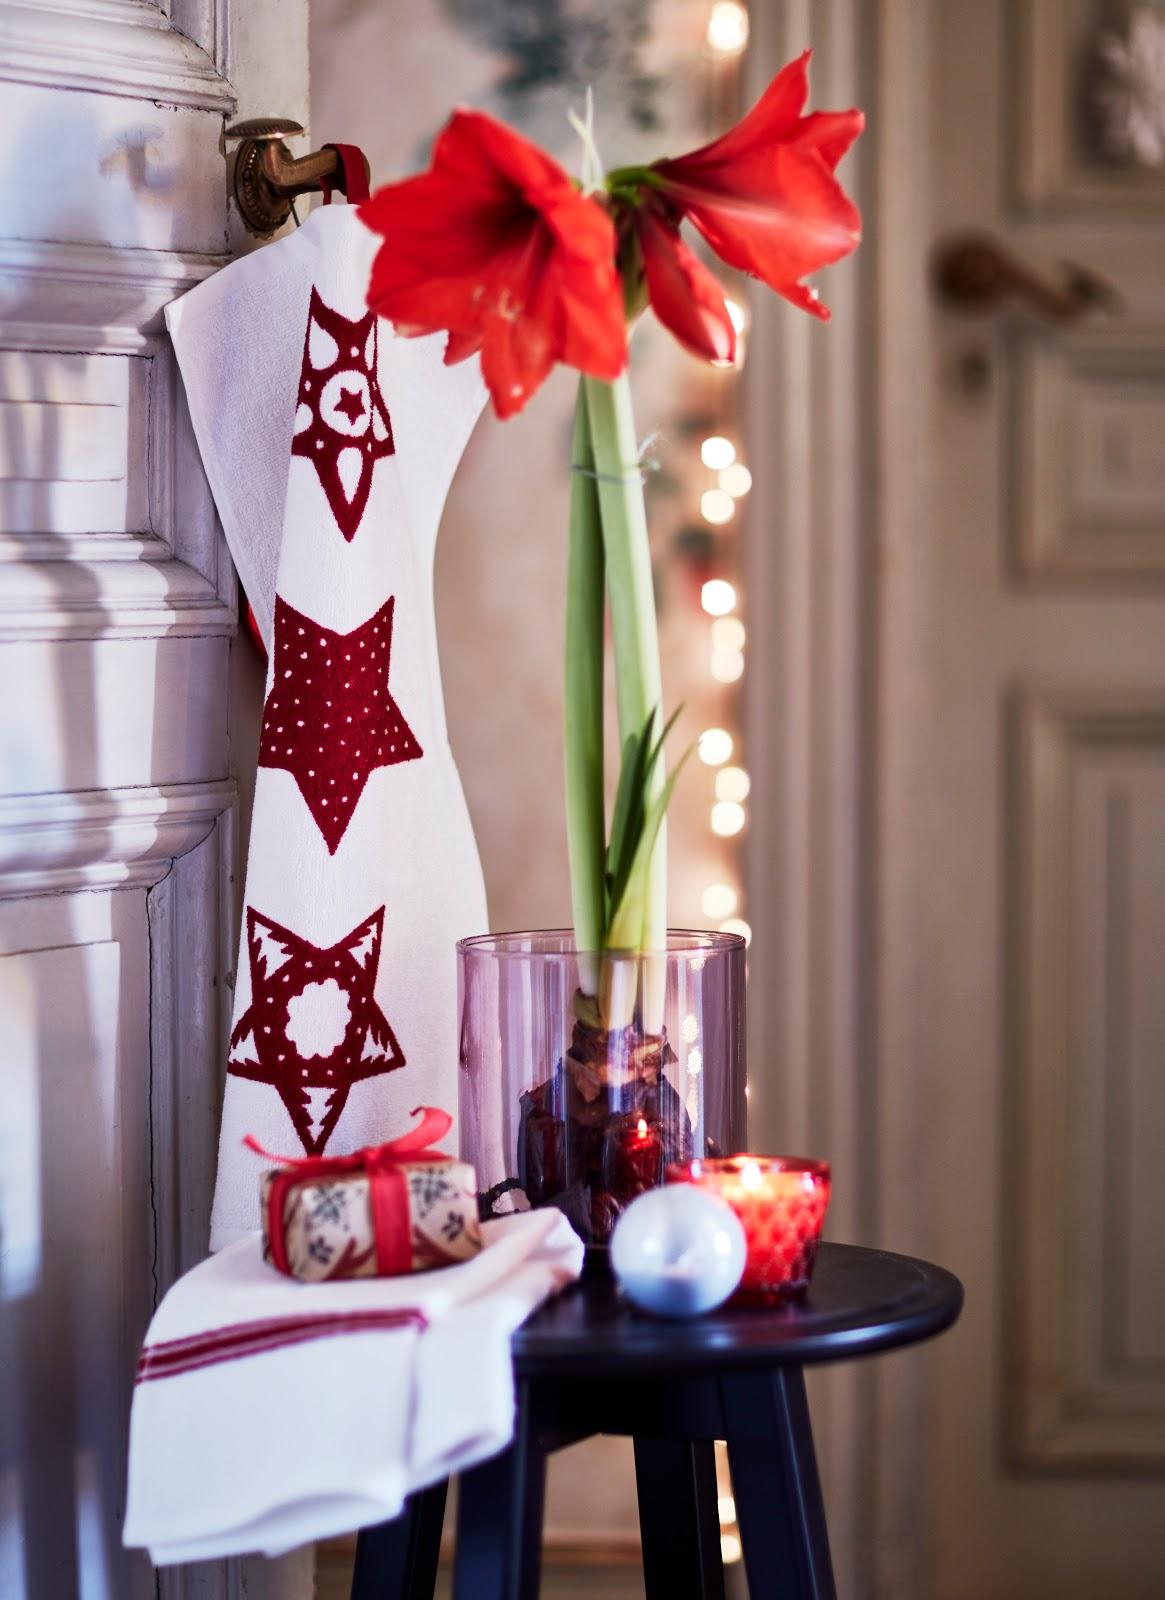 hogar diez novedades de ikea para esta navidad 2016 2017. Black Bedroom Furniture Sets. Home Design Ideas